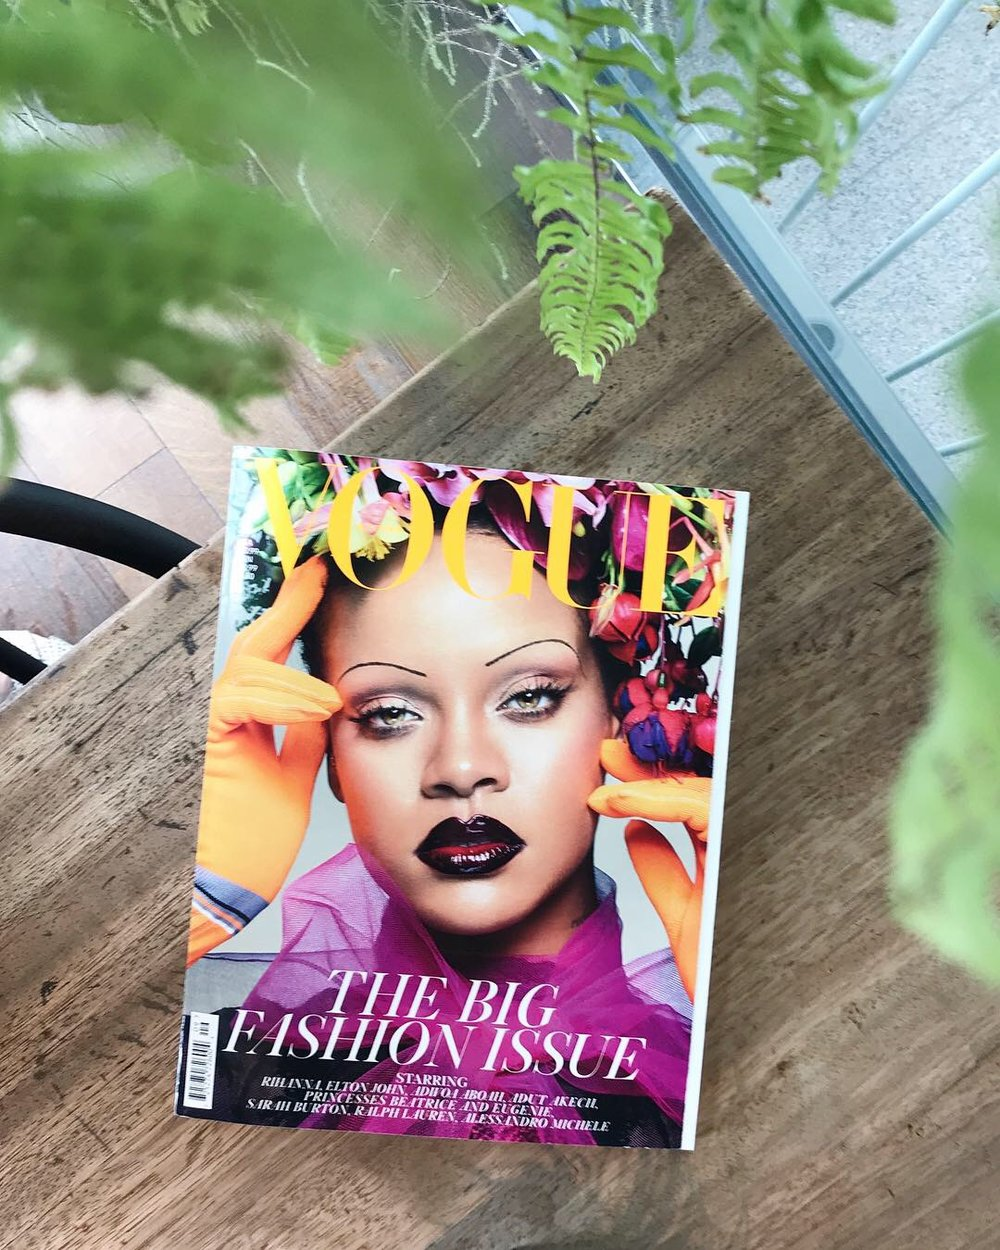 IMWIM British Vogue Sept Issue Designer Profile Cover.JPG